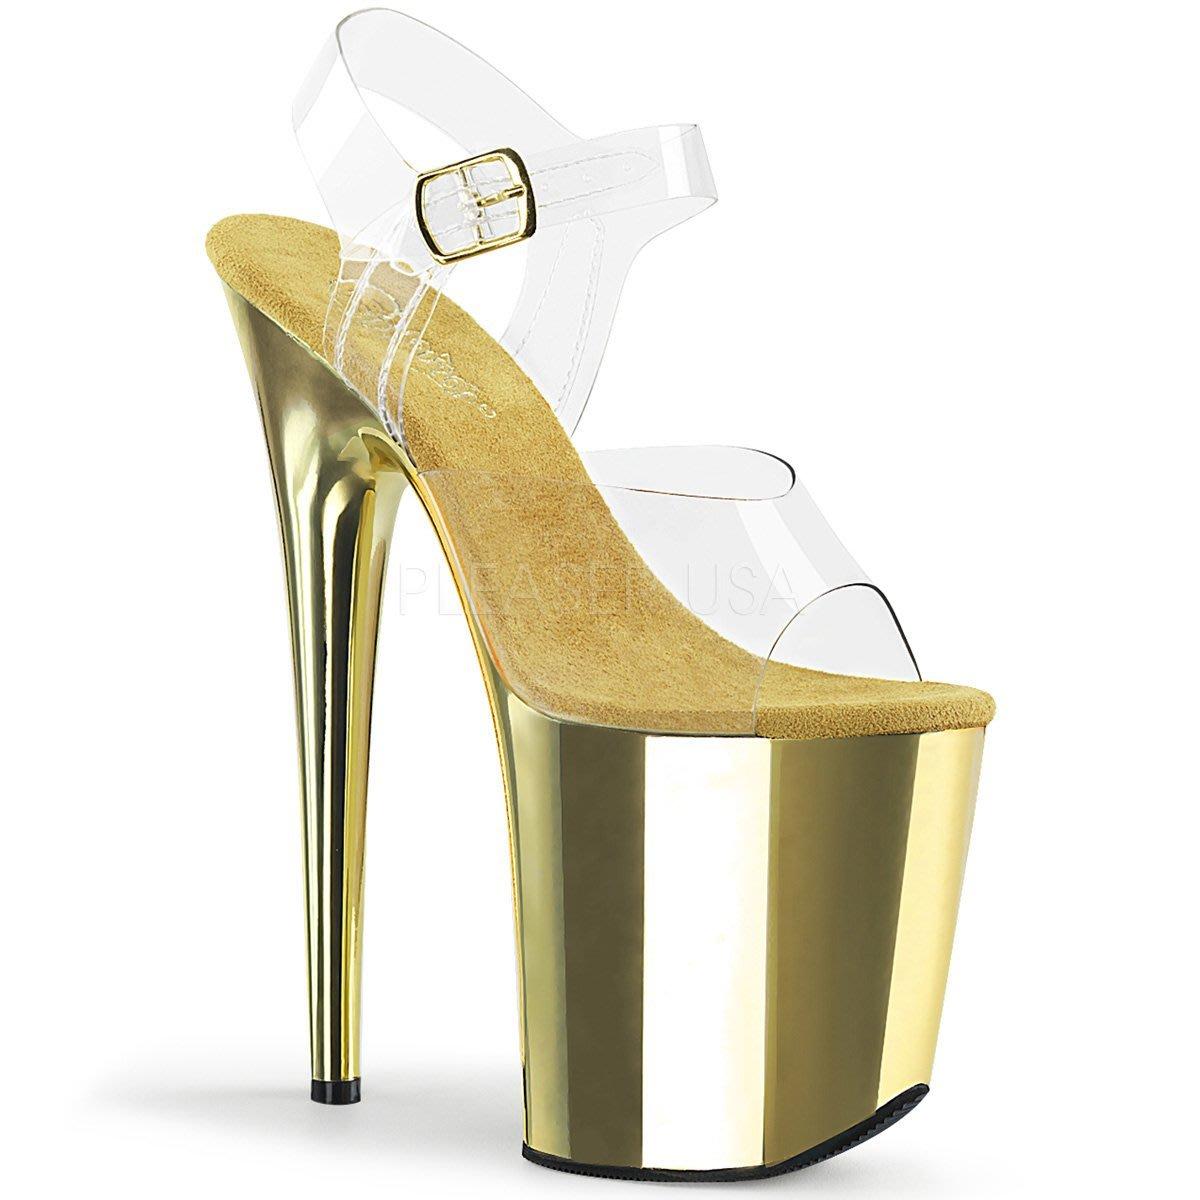 Shoes InStyle《八吋》美國品牌 PLEASER 原廠正品透明金屬鍍鉻極端厚底高跟涼鞋 有大尺碼 『金色』